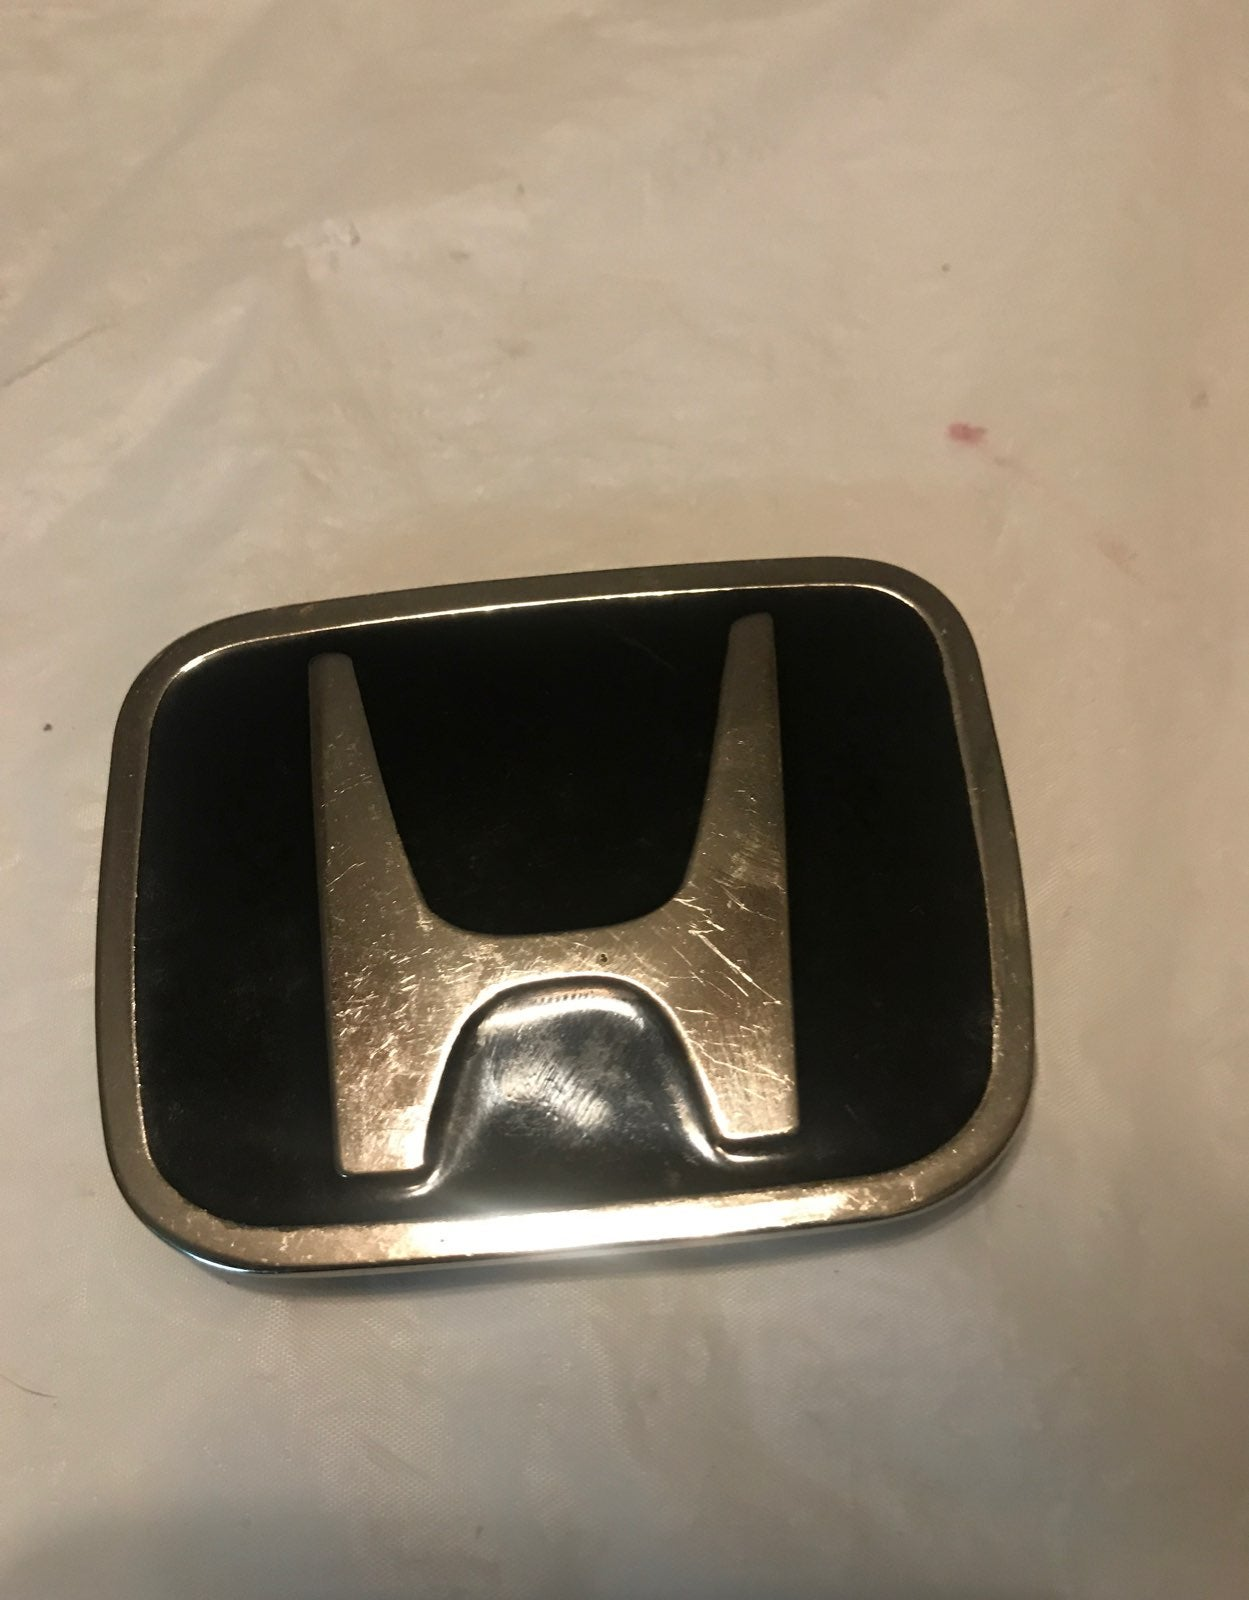 Honda buckle